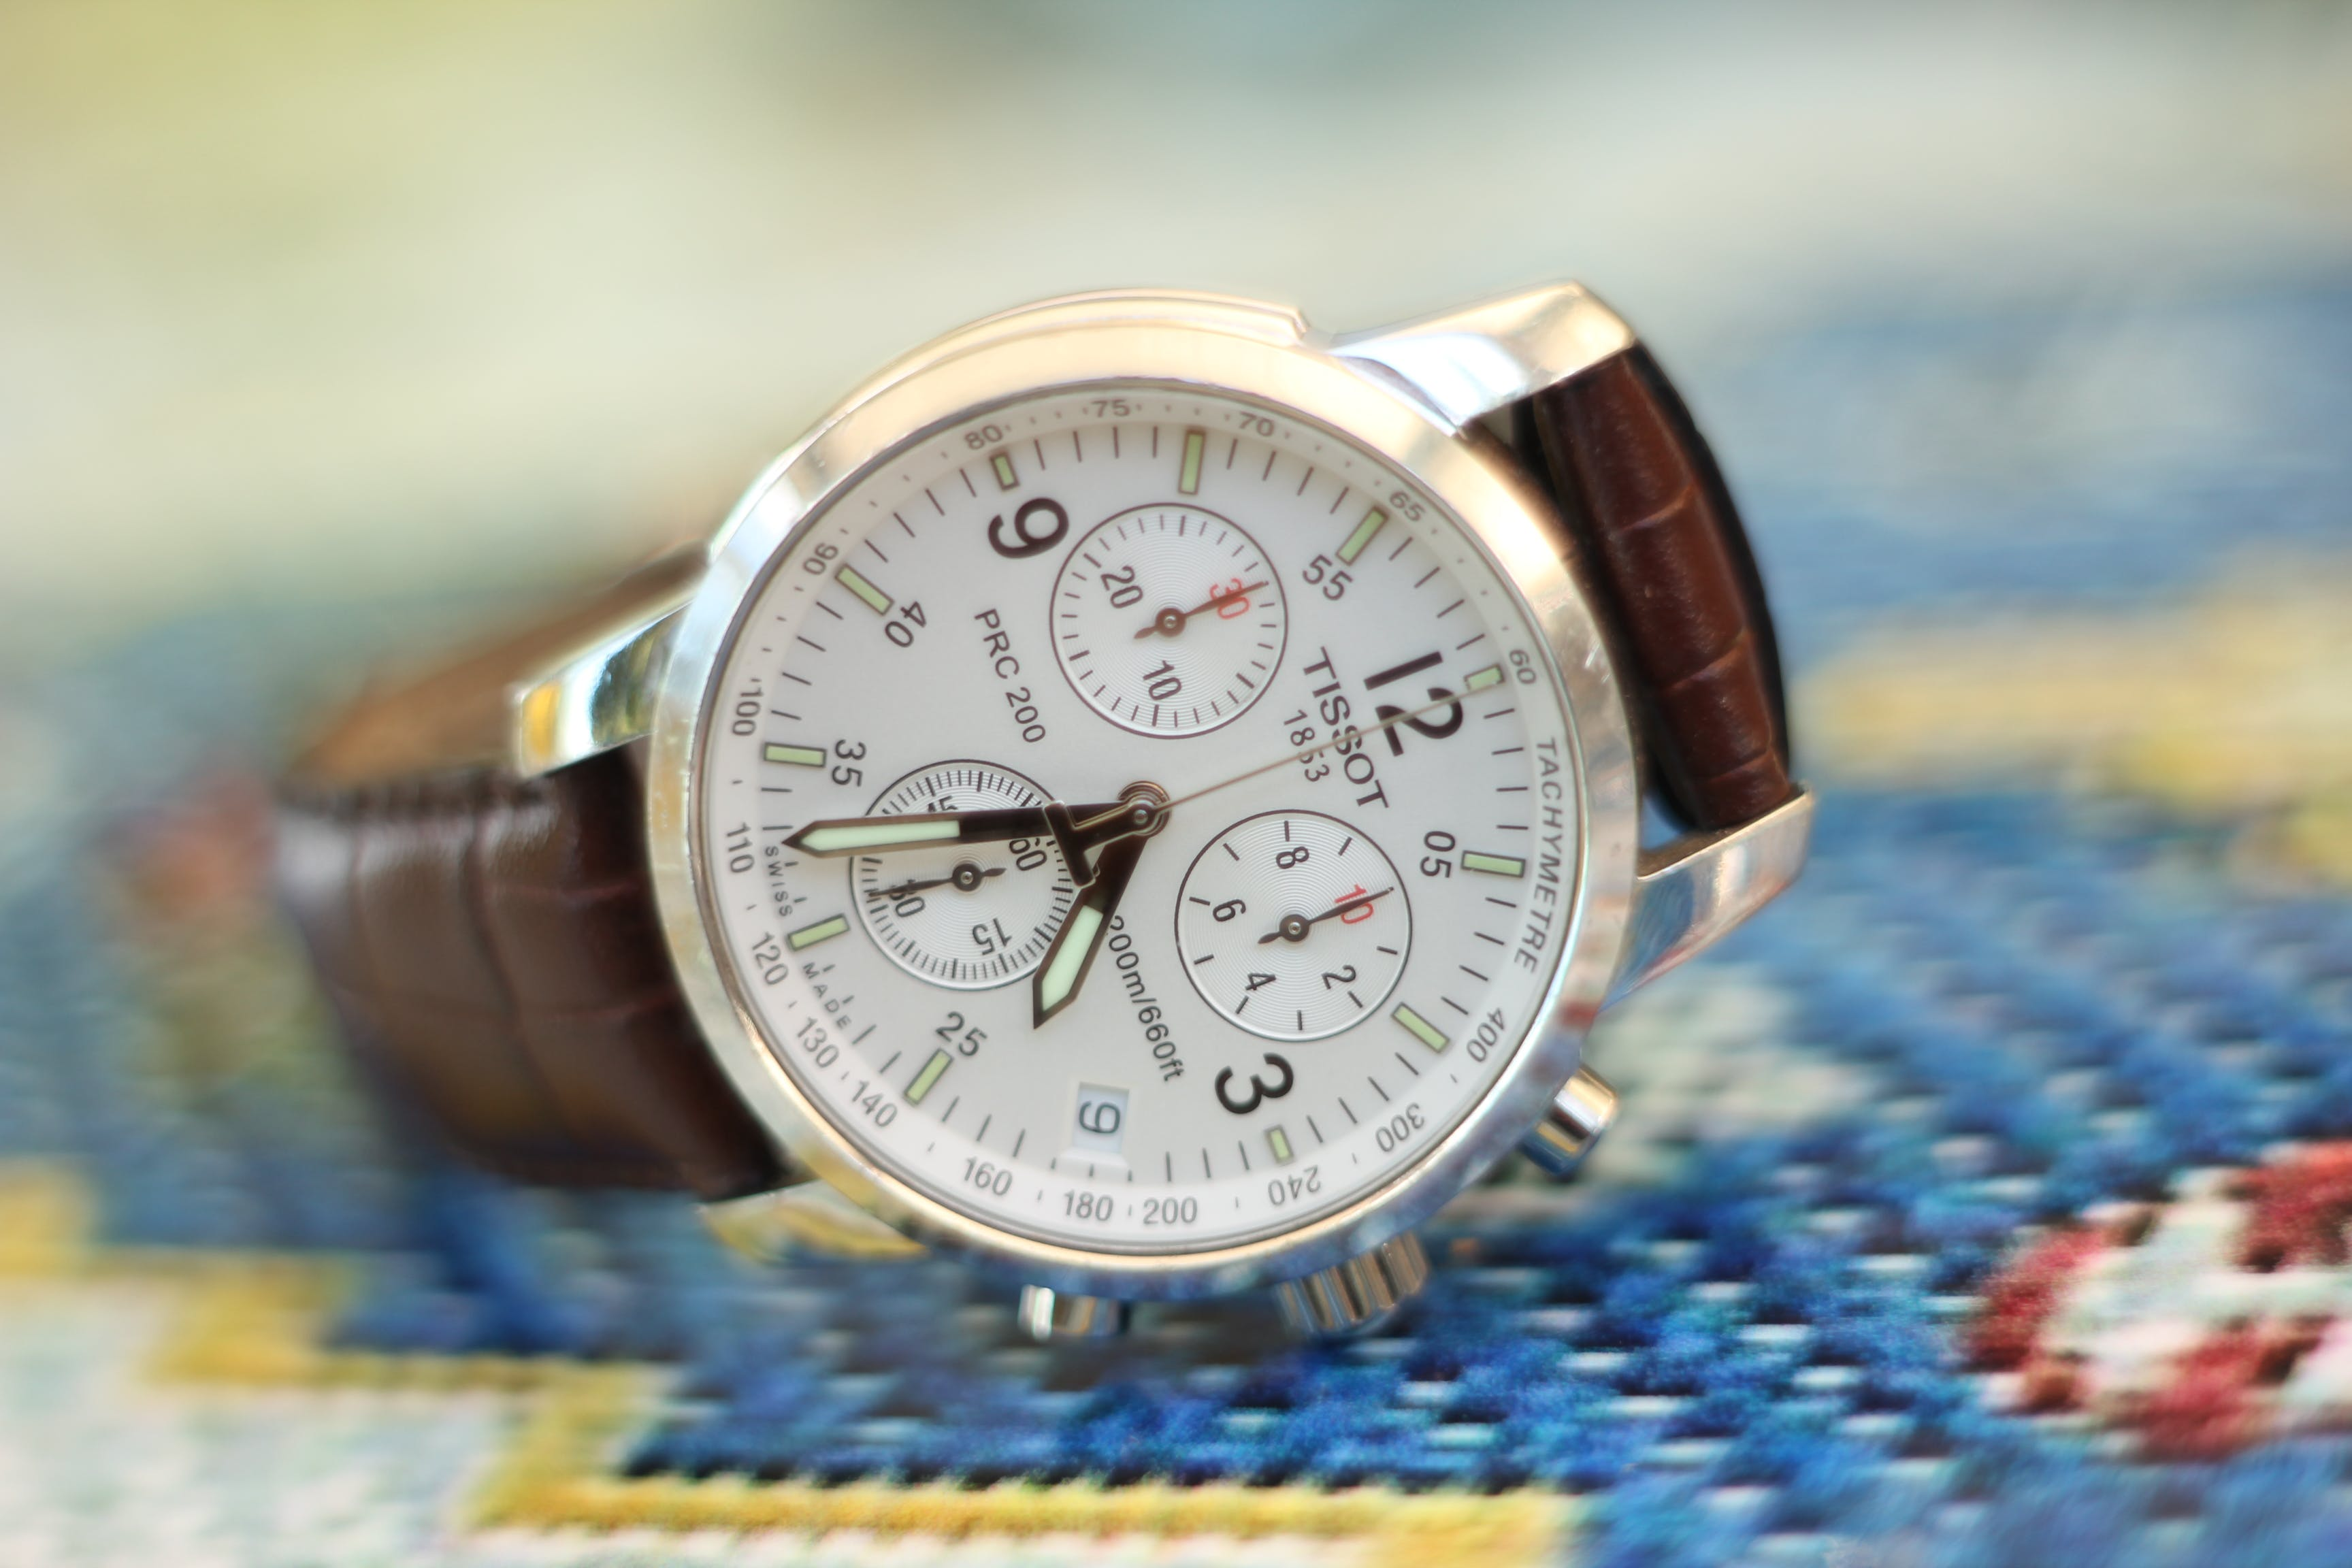 Free stock photo of Tissot Men's Watches